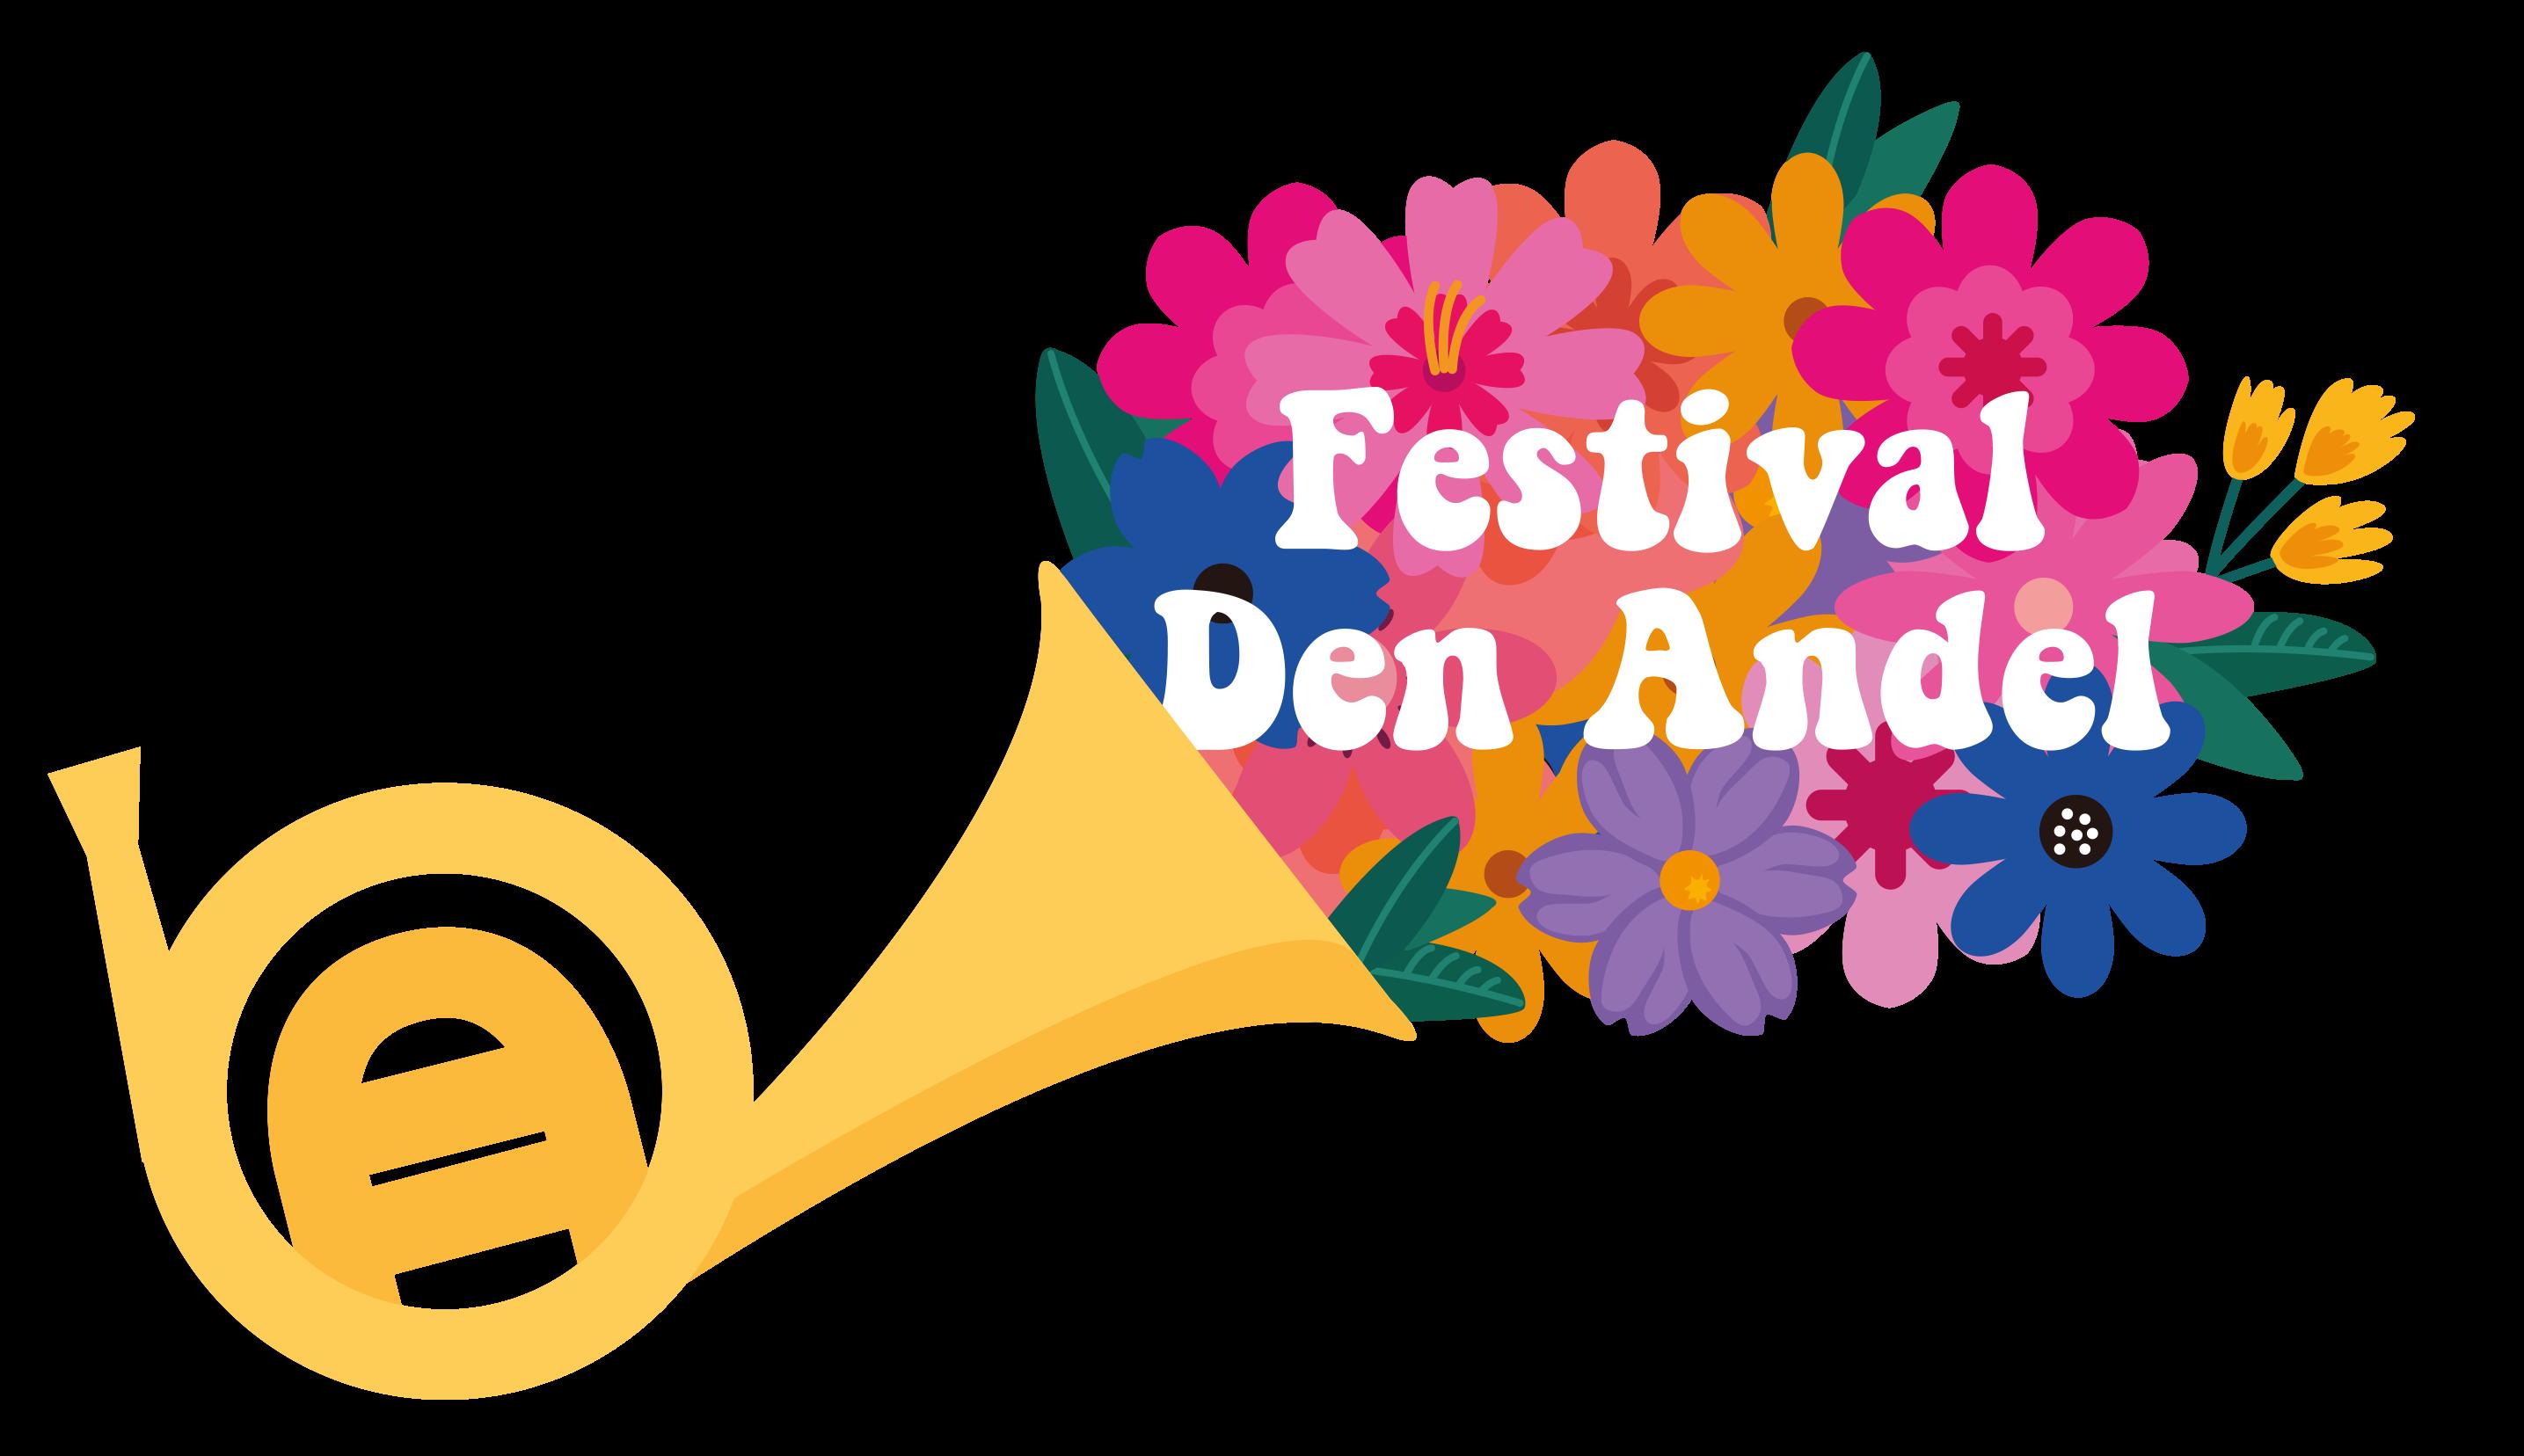 Festival Den Andel